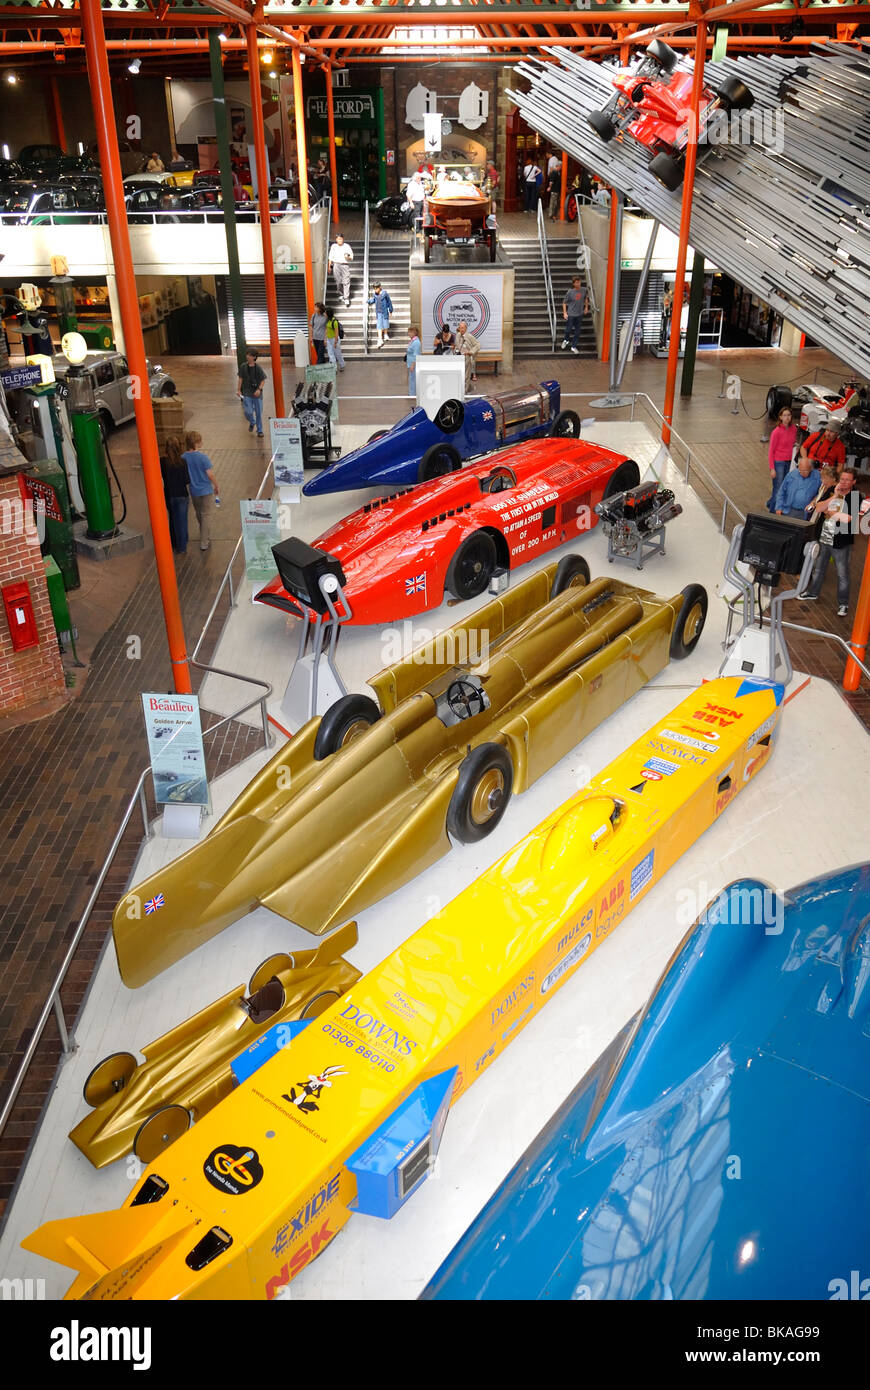 Innere des Beaulieu National Motor Museum, Brockenhurst, Hampshire, Großbritannien Stockbild